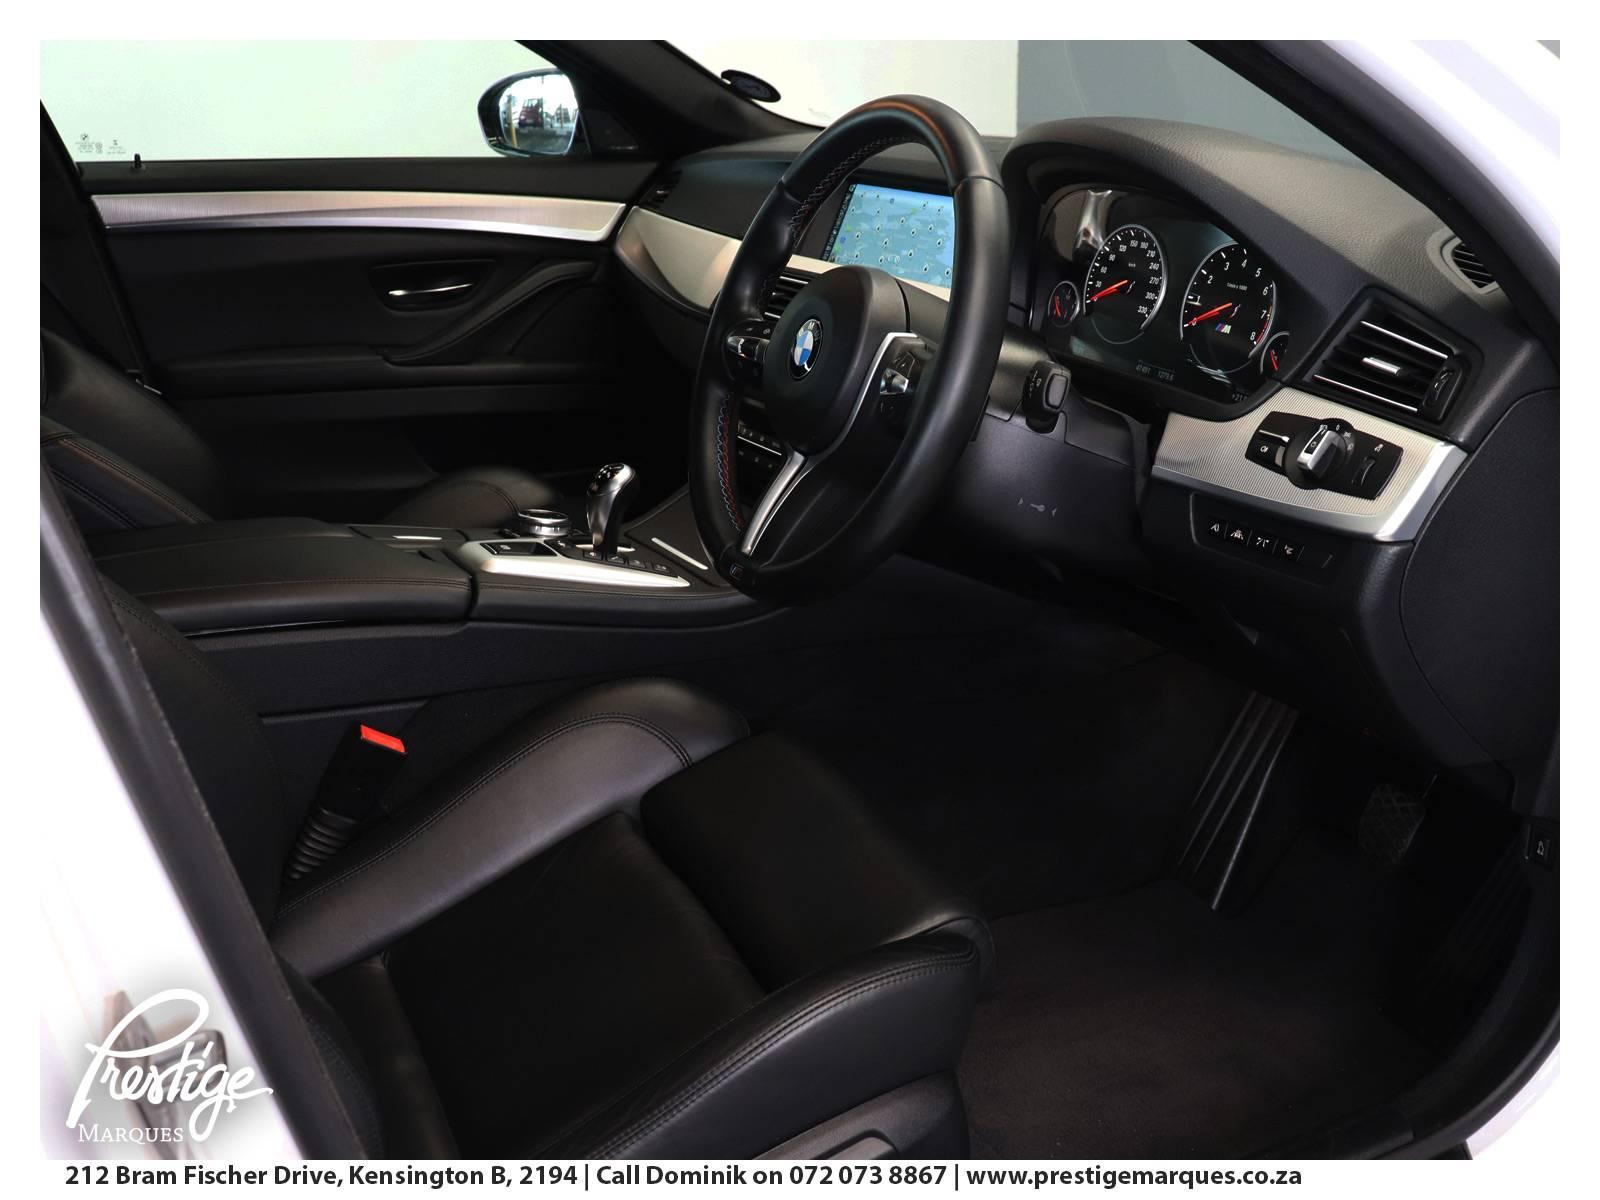 2015-BMW-F10-M5-MDCT-Prestige-Marques-Randburg-Sandton-10